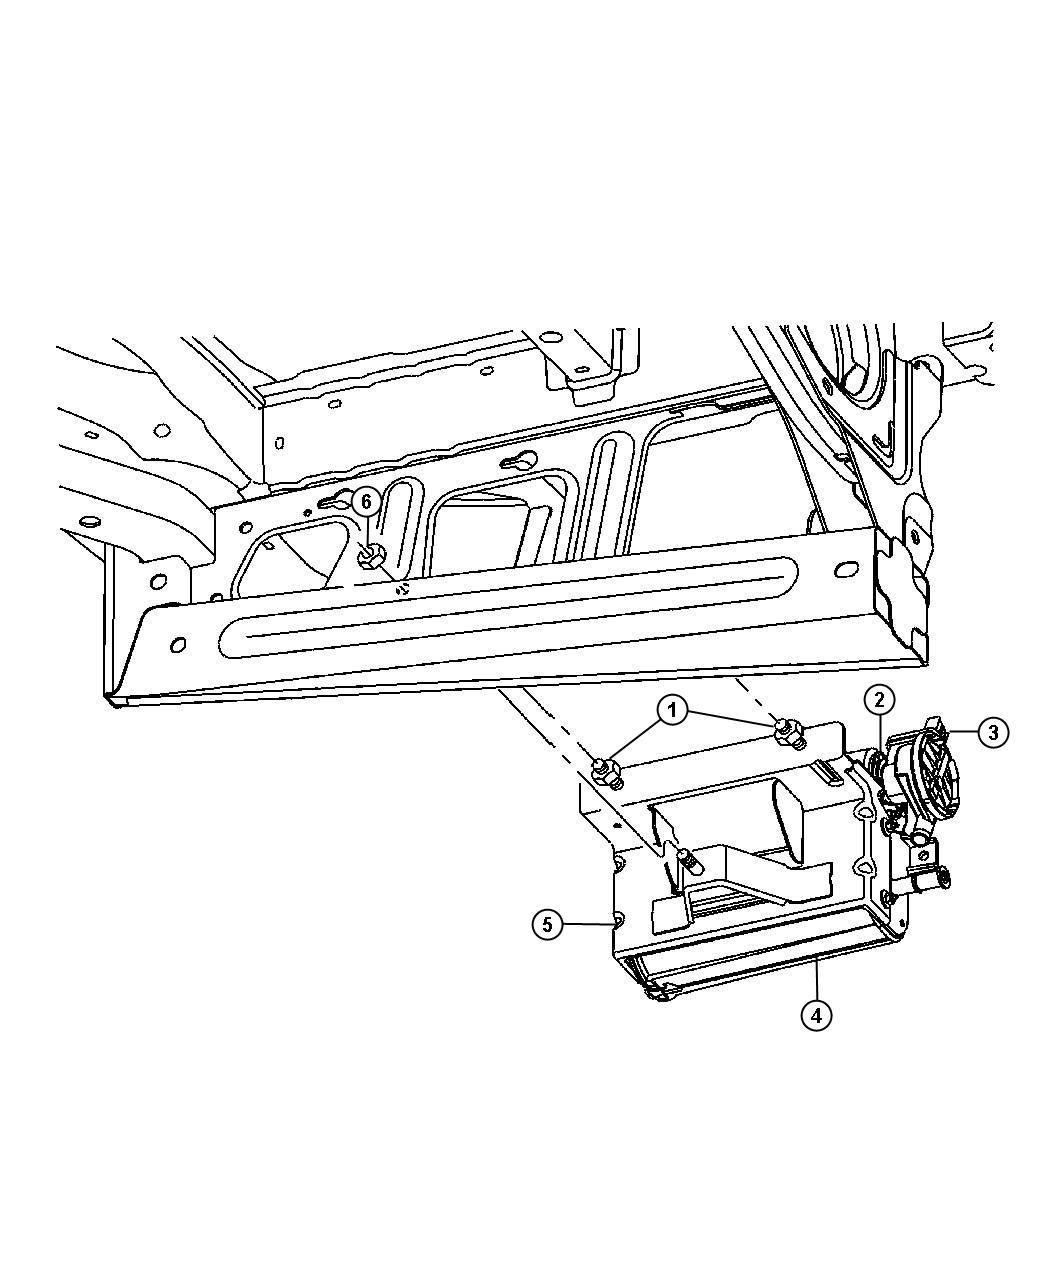 1998 Jeep Grand Cherokee Filter. Fuel vapor vent, leak